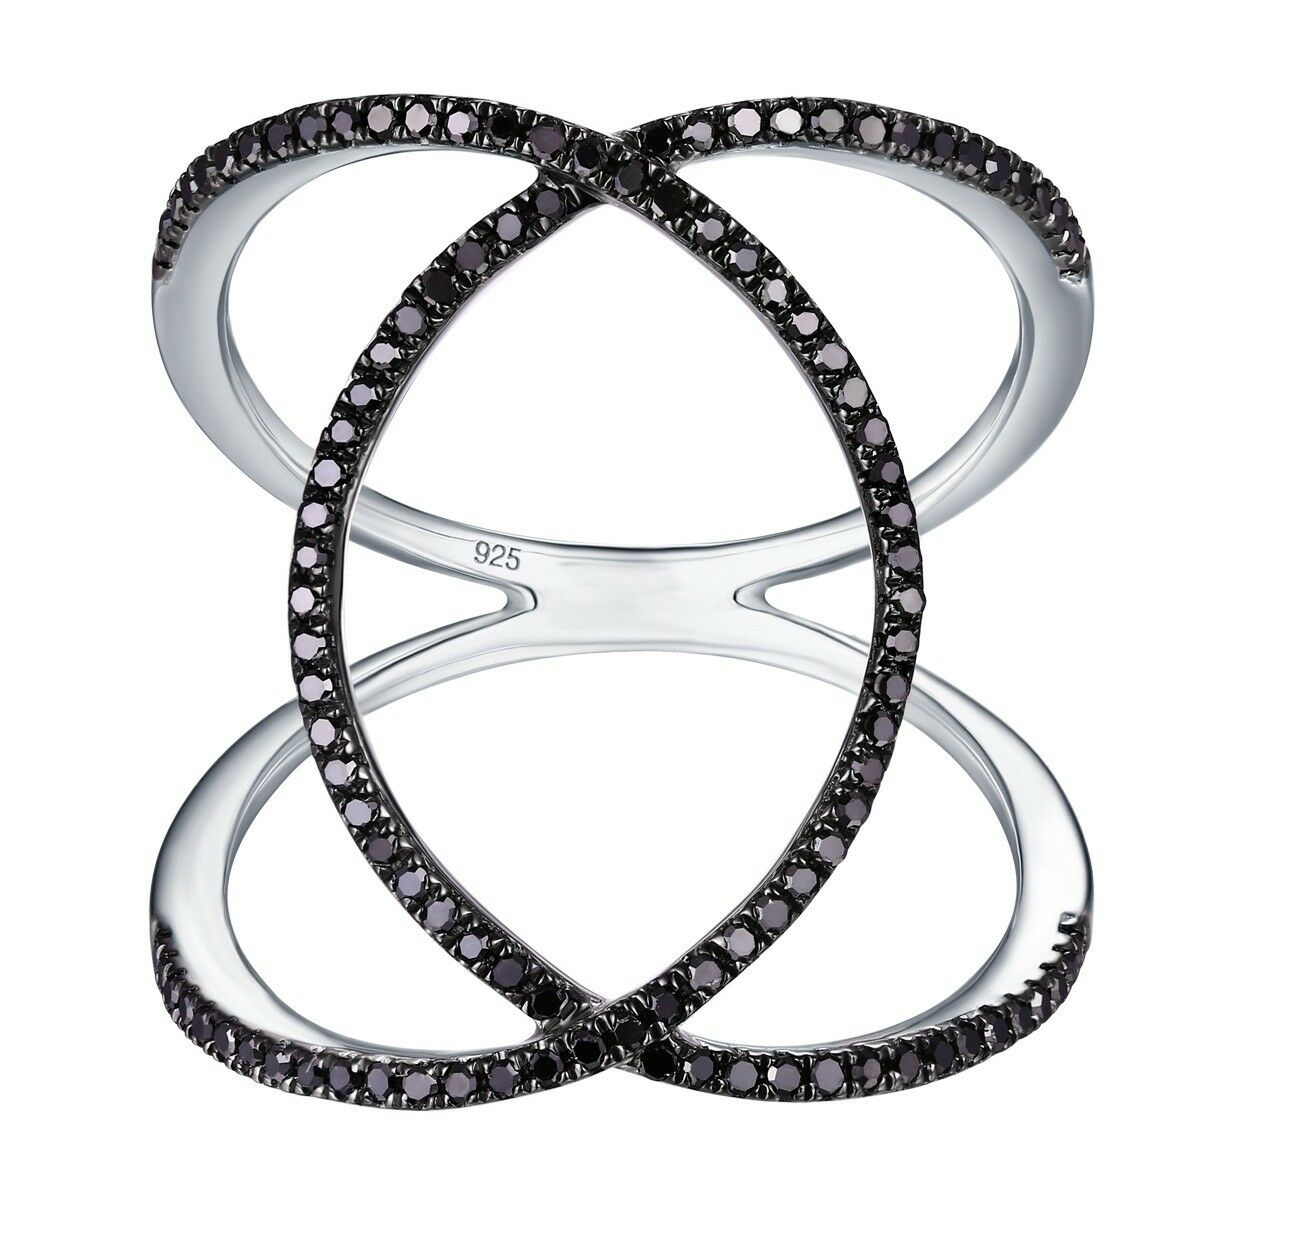 Prism Jewel 0.31Ct Round Black Diamond Criss Cross Wrap Ring